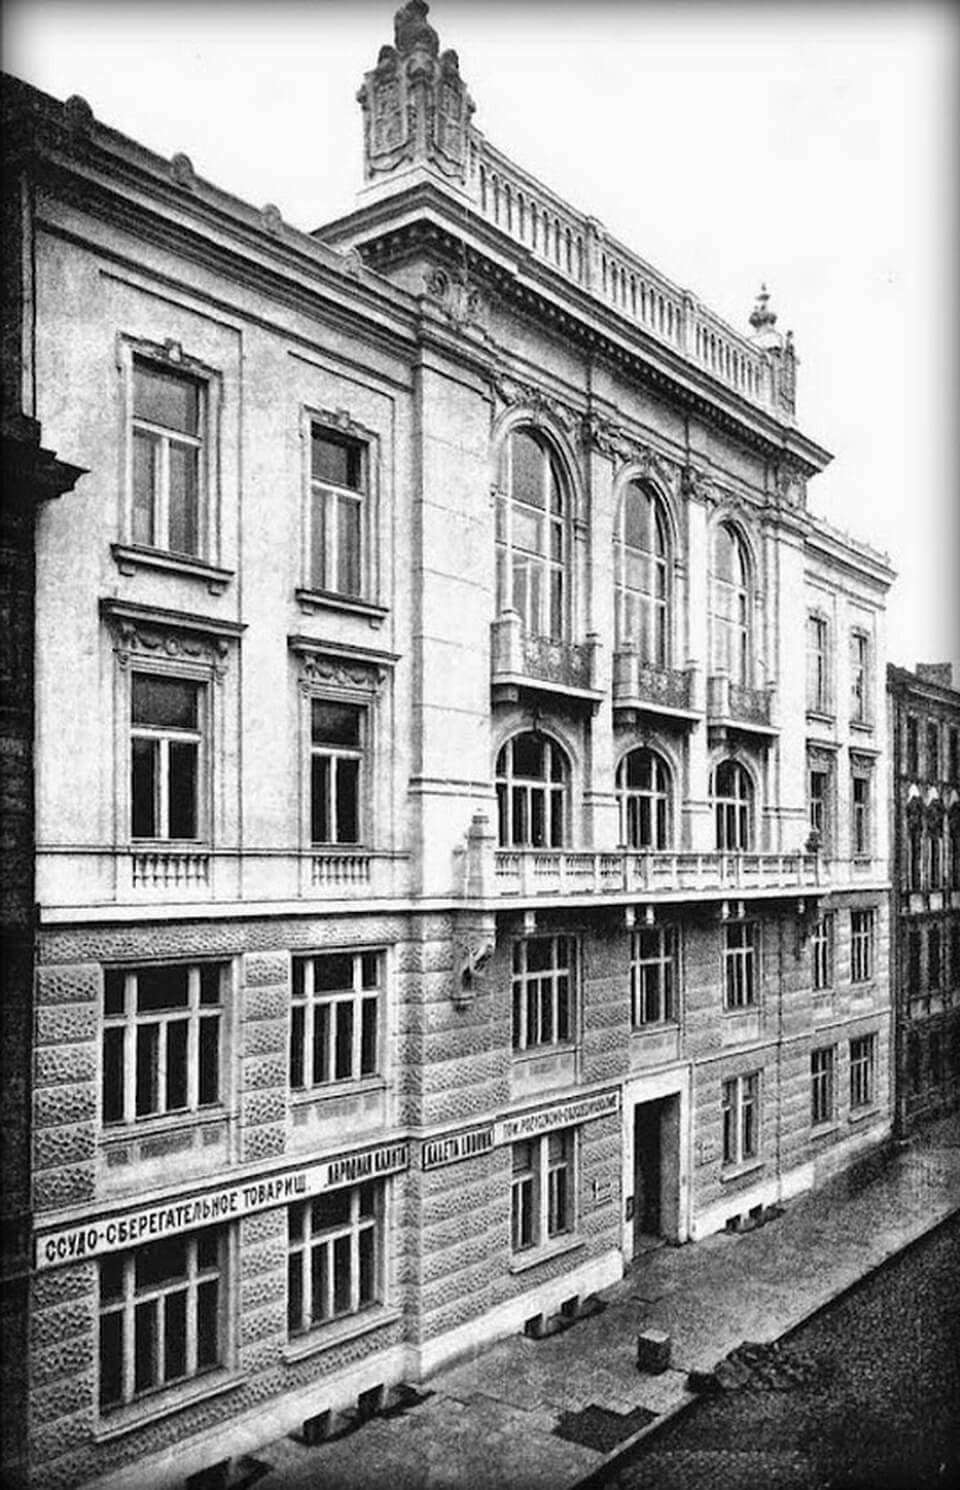 Sienna 16: a temporary orphanage of Janusz Korczak